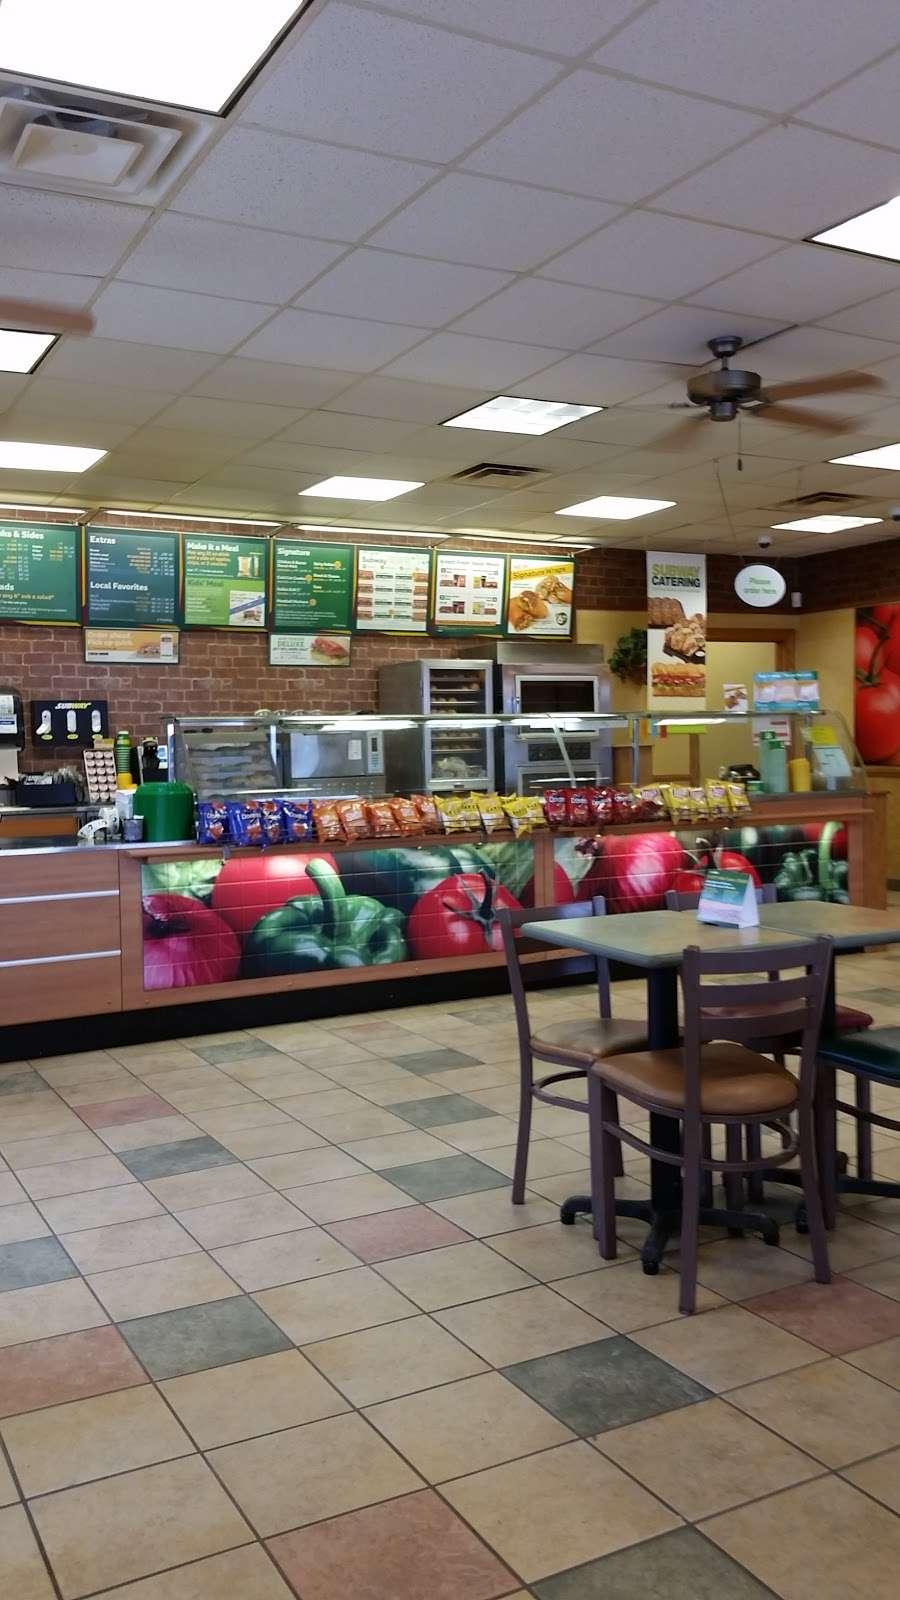 Subway - restaurant  | Photo 3 of 5 | Address: 199 E Main St, Russiaville, IN 46979, USA | Phone: (765) 883-3000